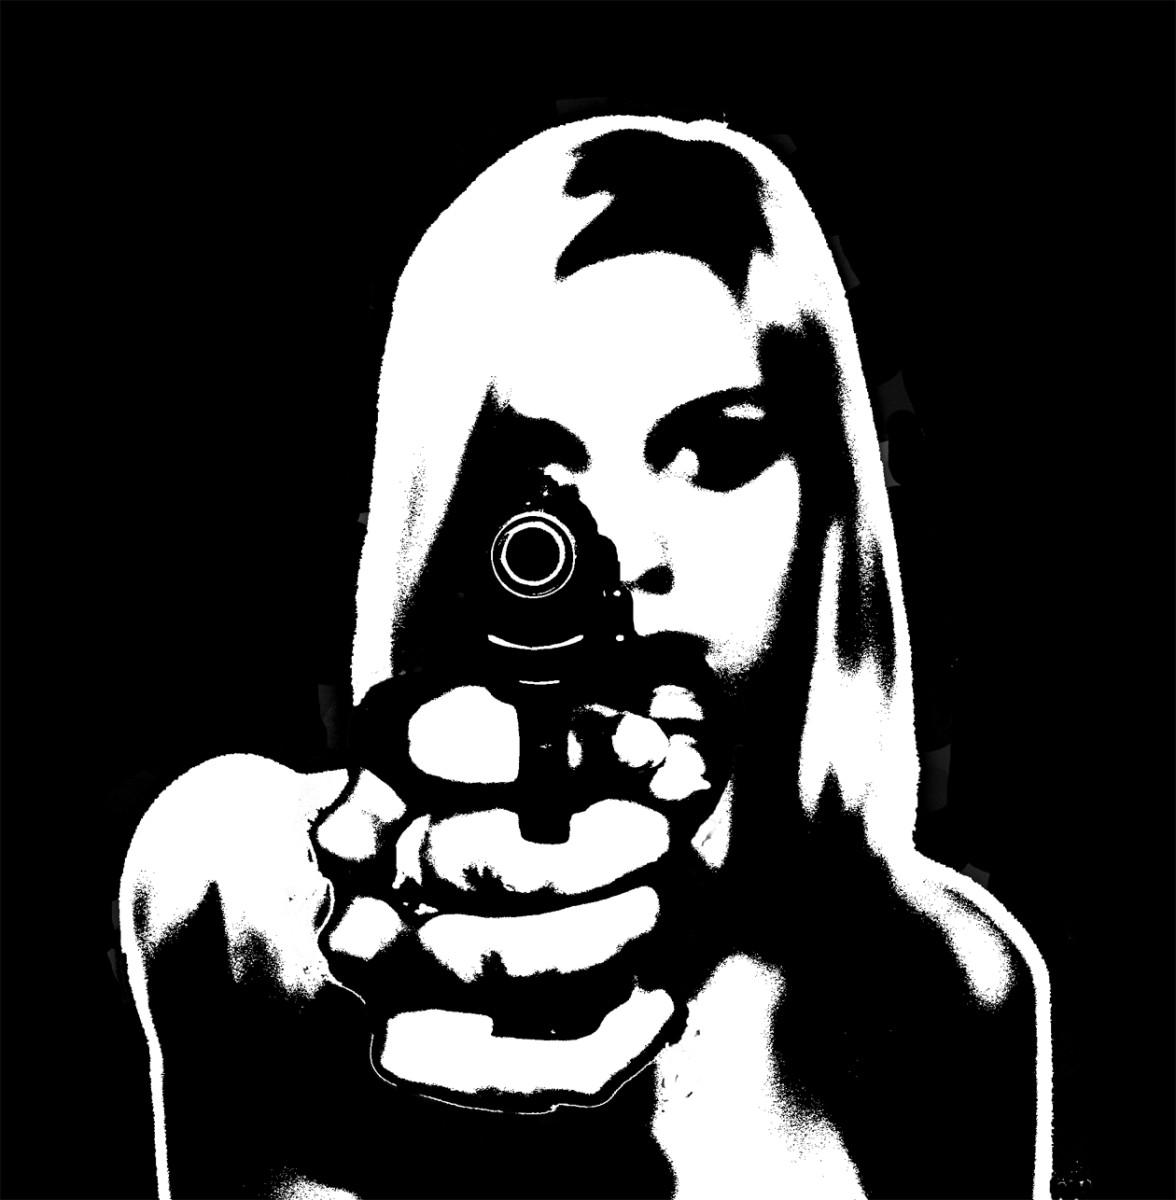 My gun?